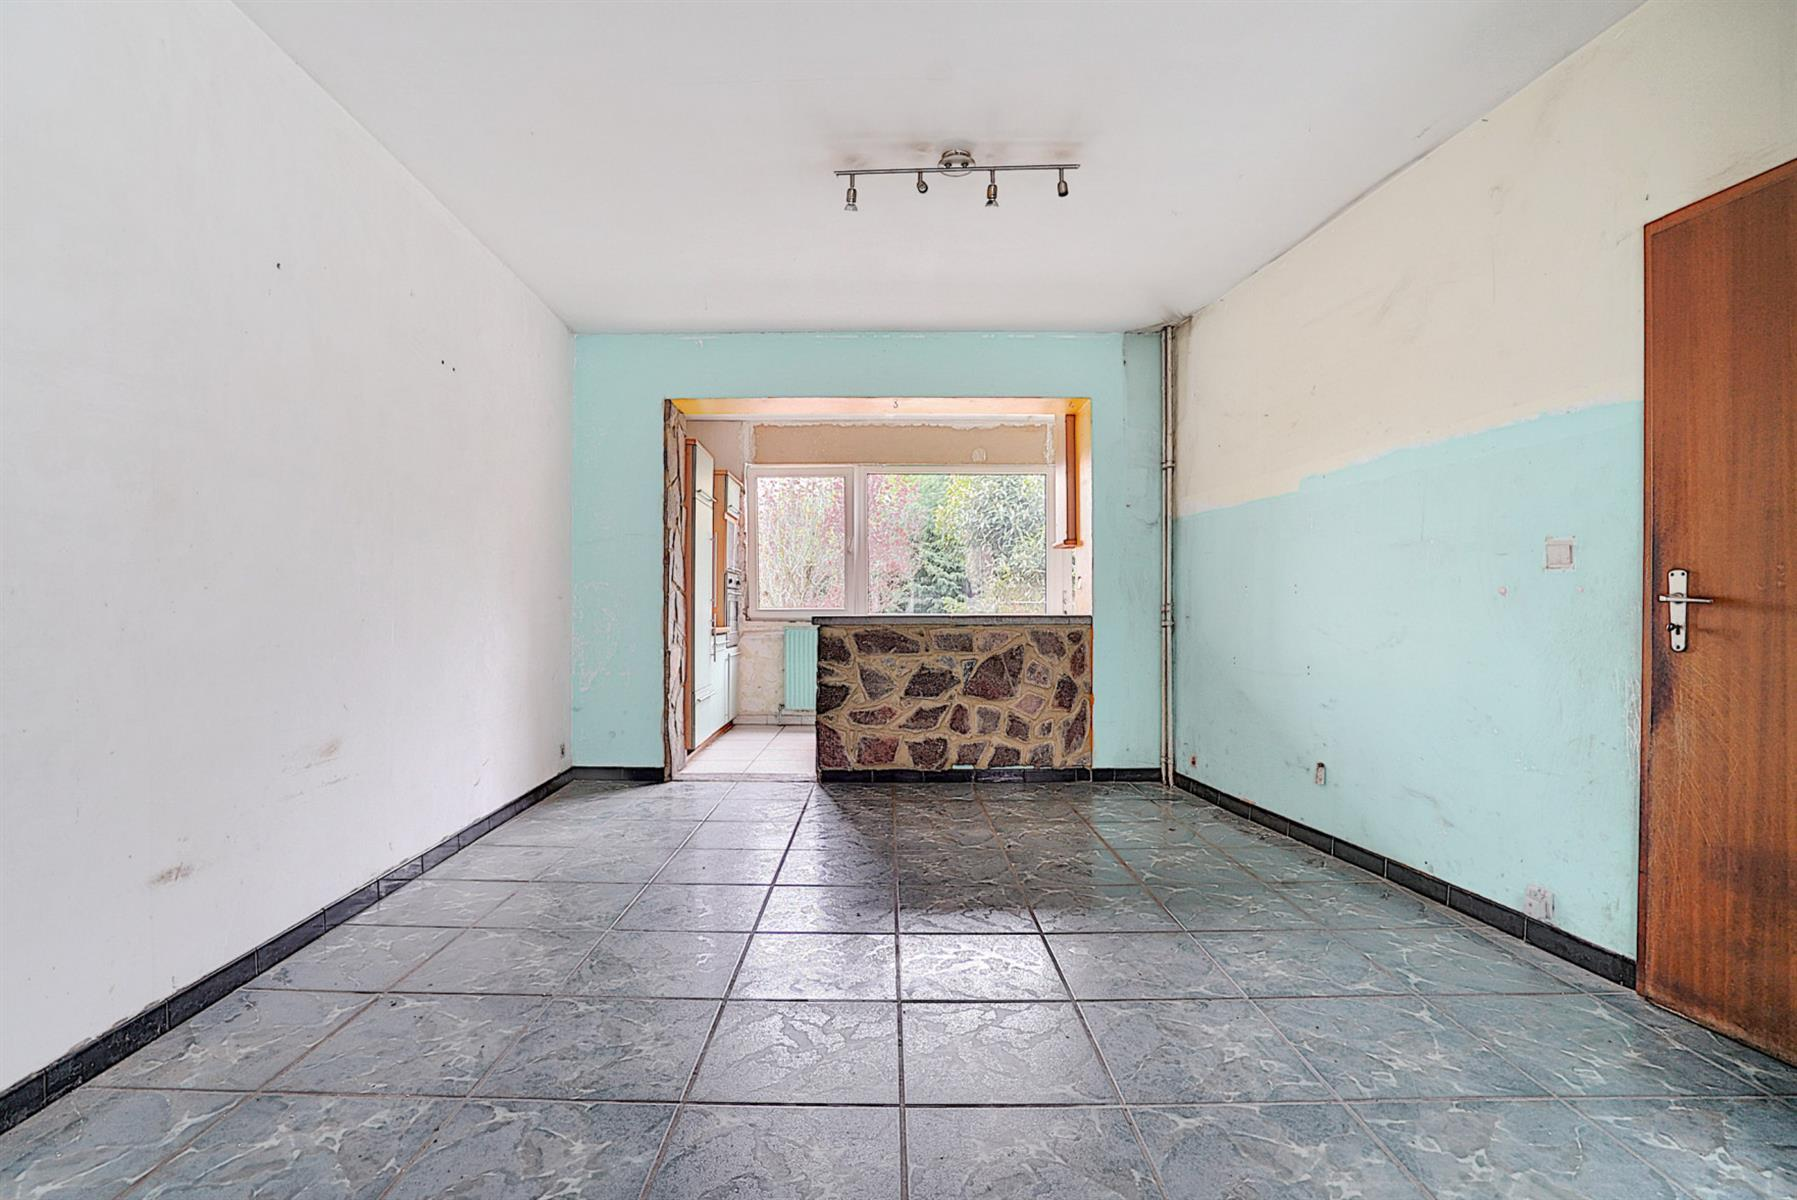 Maison - Saint-nicolas - #4357054-4